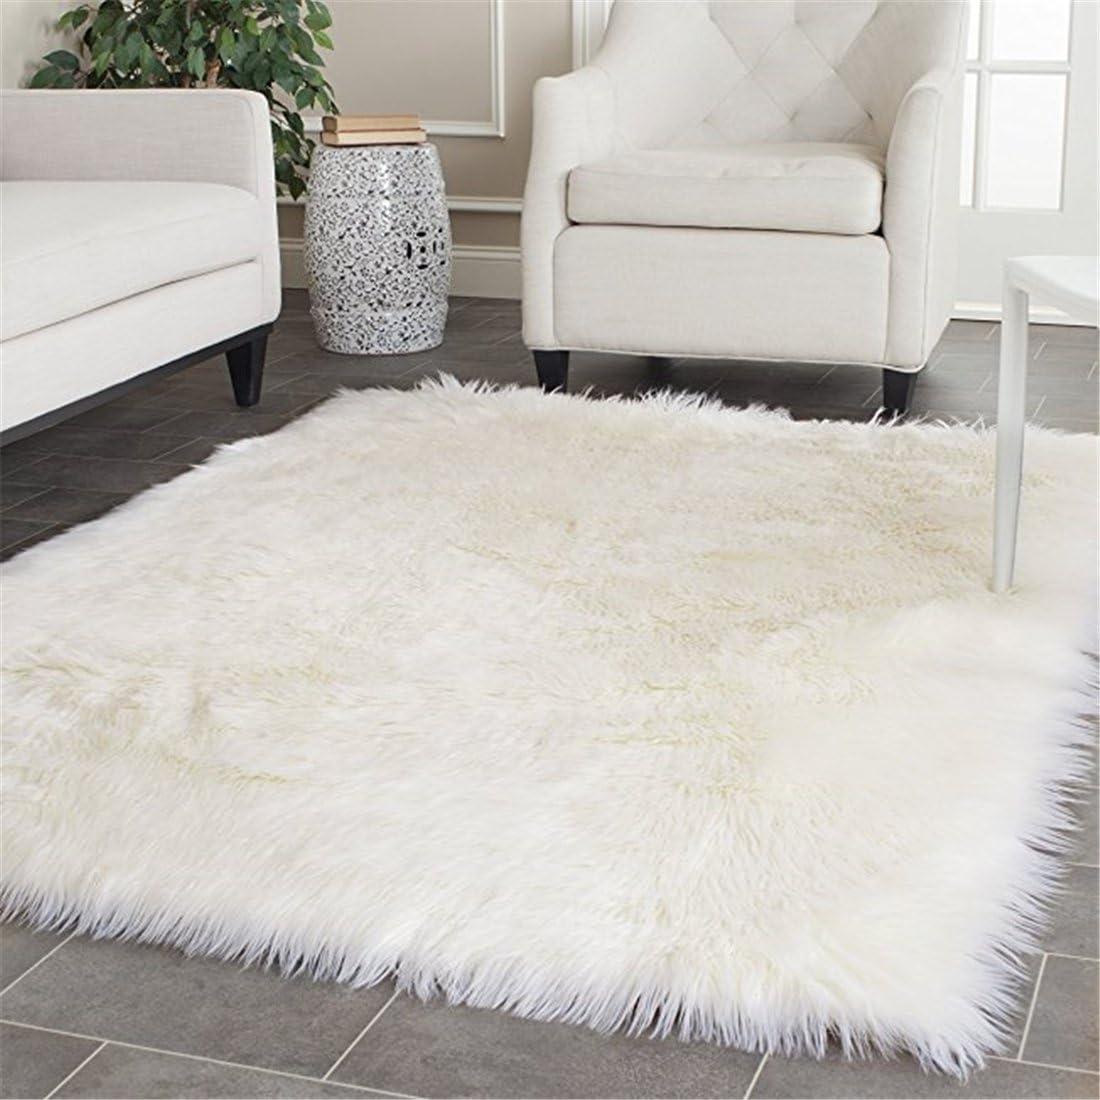 FurFurug Faux Silky Deluxe Sheepskin Area Shag Rug Children Play Carpet White,3x5ft